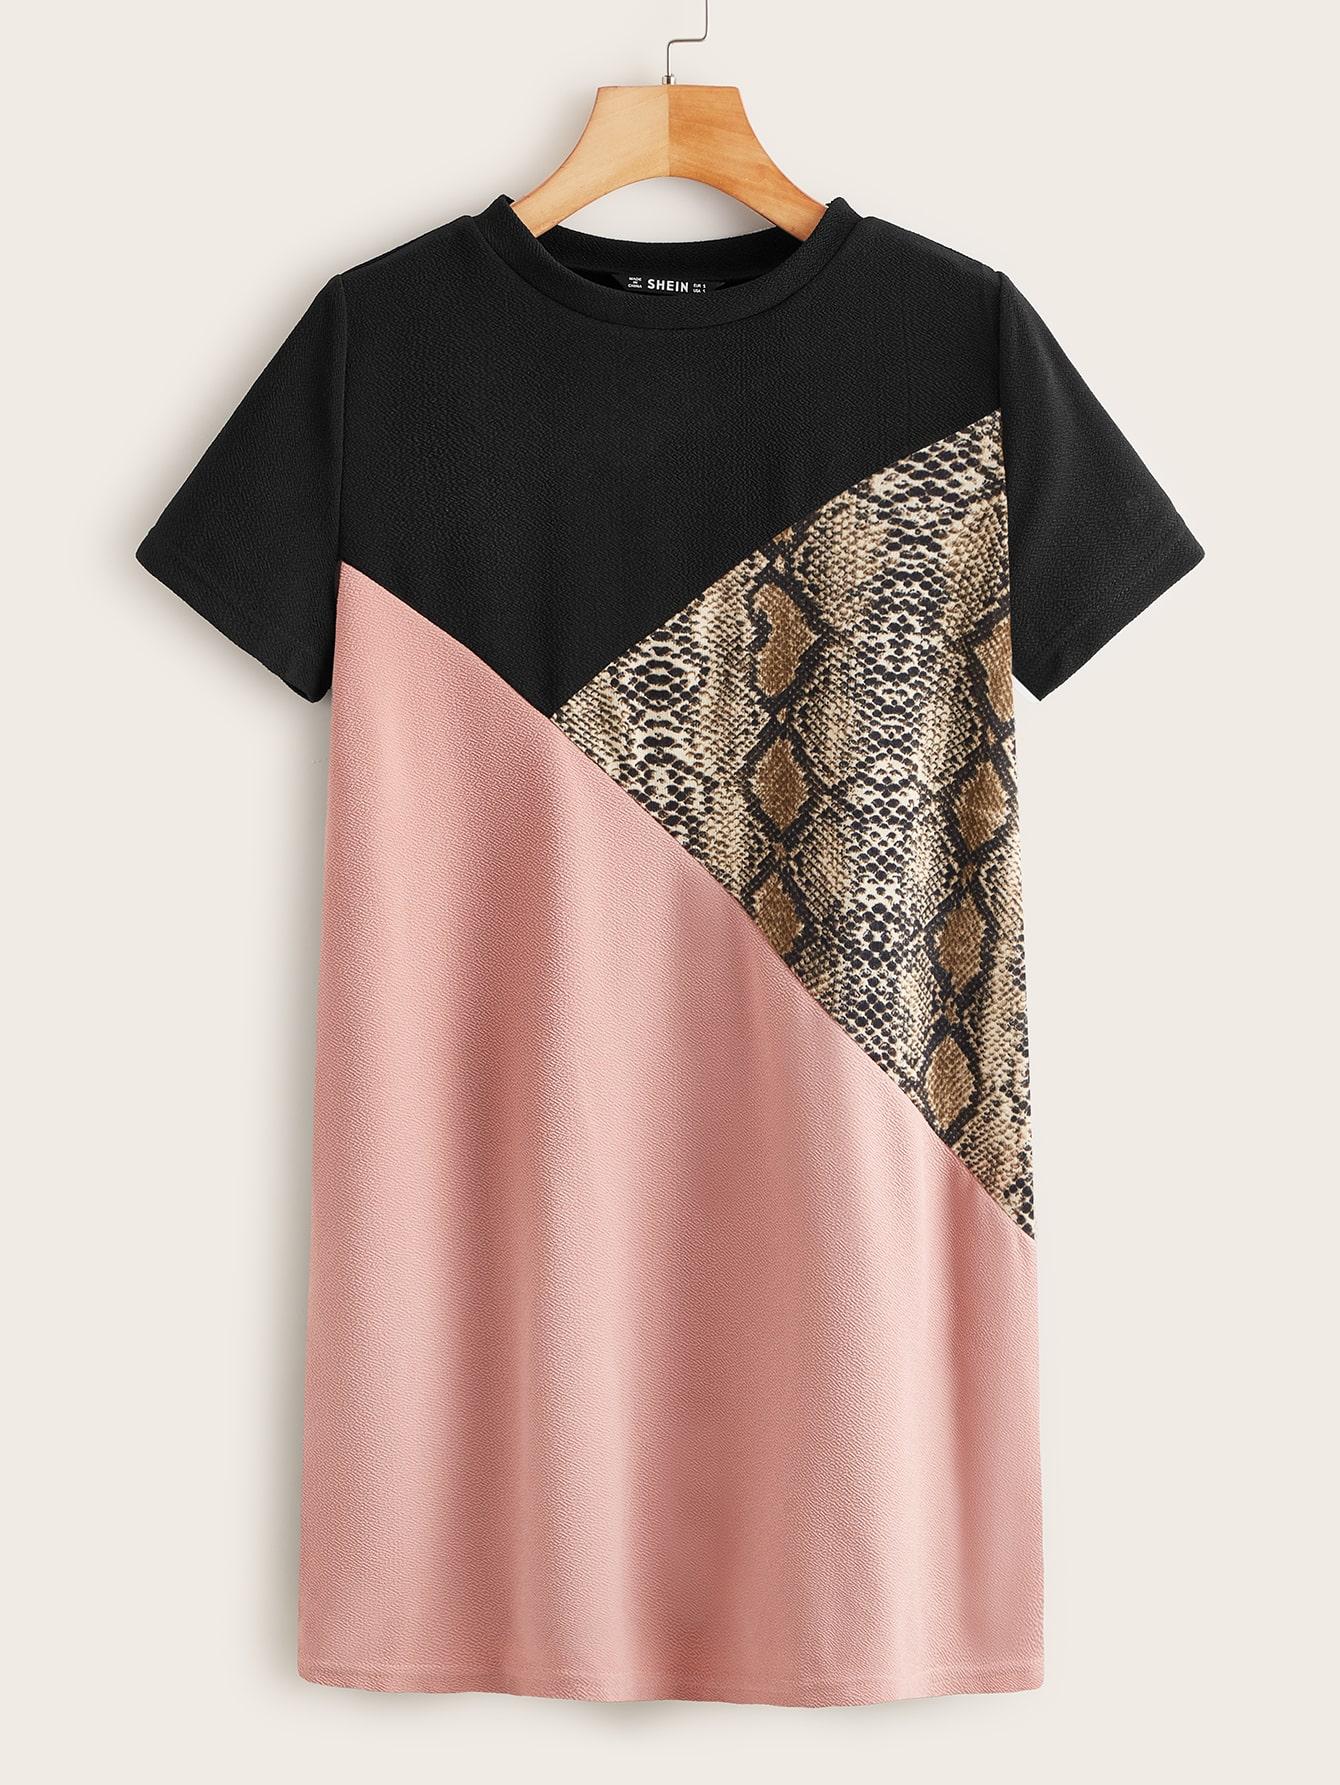 Snakeskin Colorblock Tee Dress thumbnail